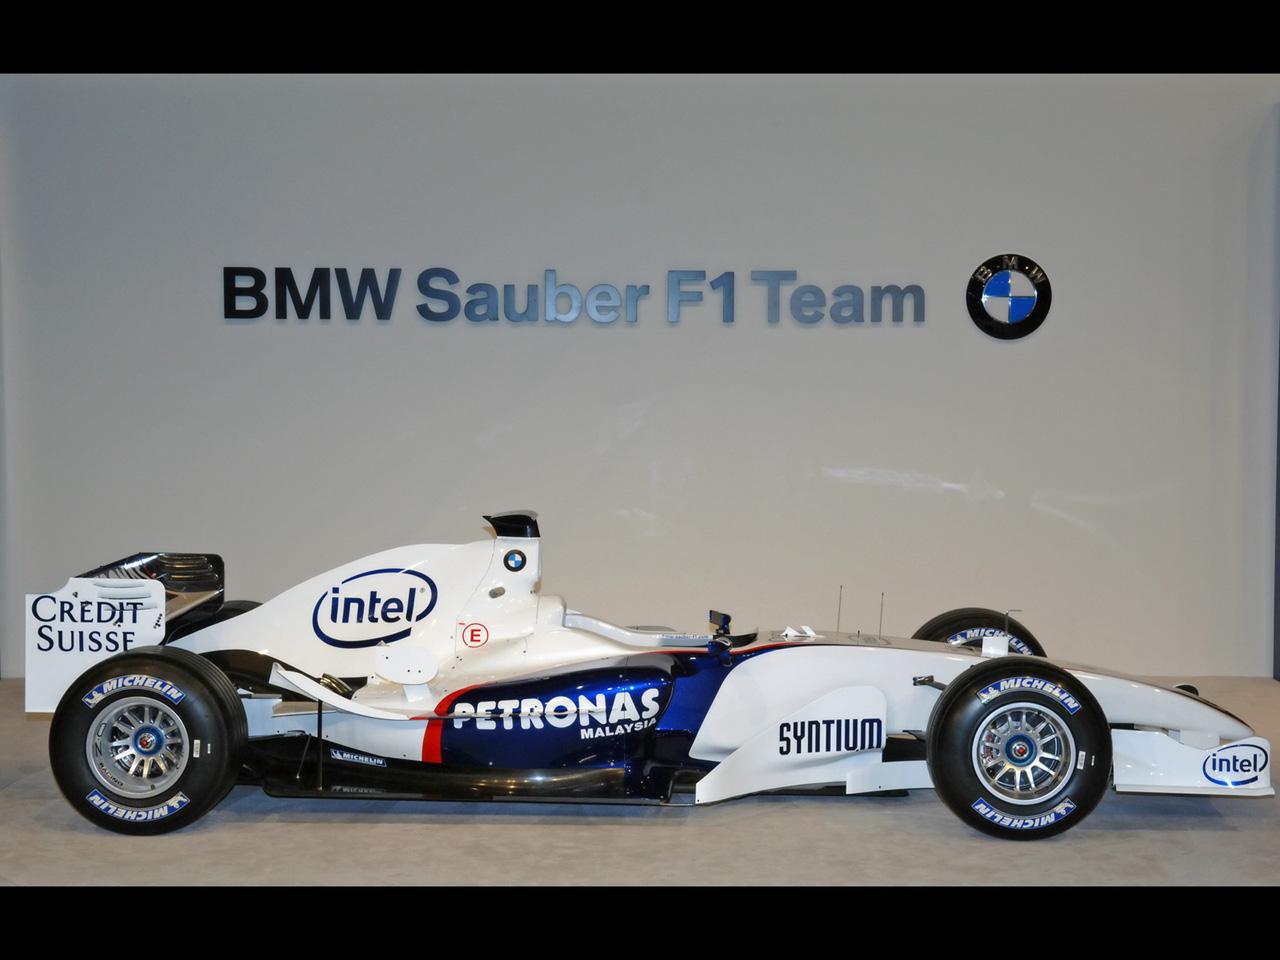 http://3.bp.blogspot.com/-Y20SMXgy-Fg/TcpUYJ6Oh-I/AAAAAAAAB6E/G3D4ydKQZKA/s1600/2006-BMW-Sauber-F1.06-SideR-1280x960.jpg